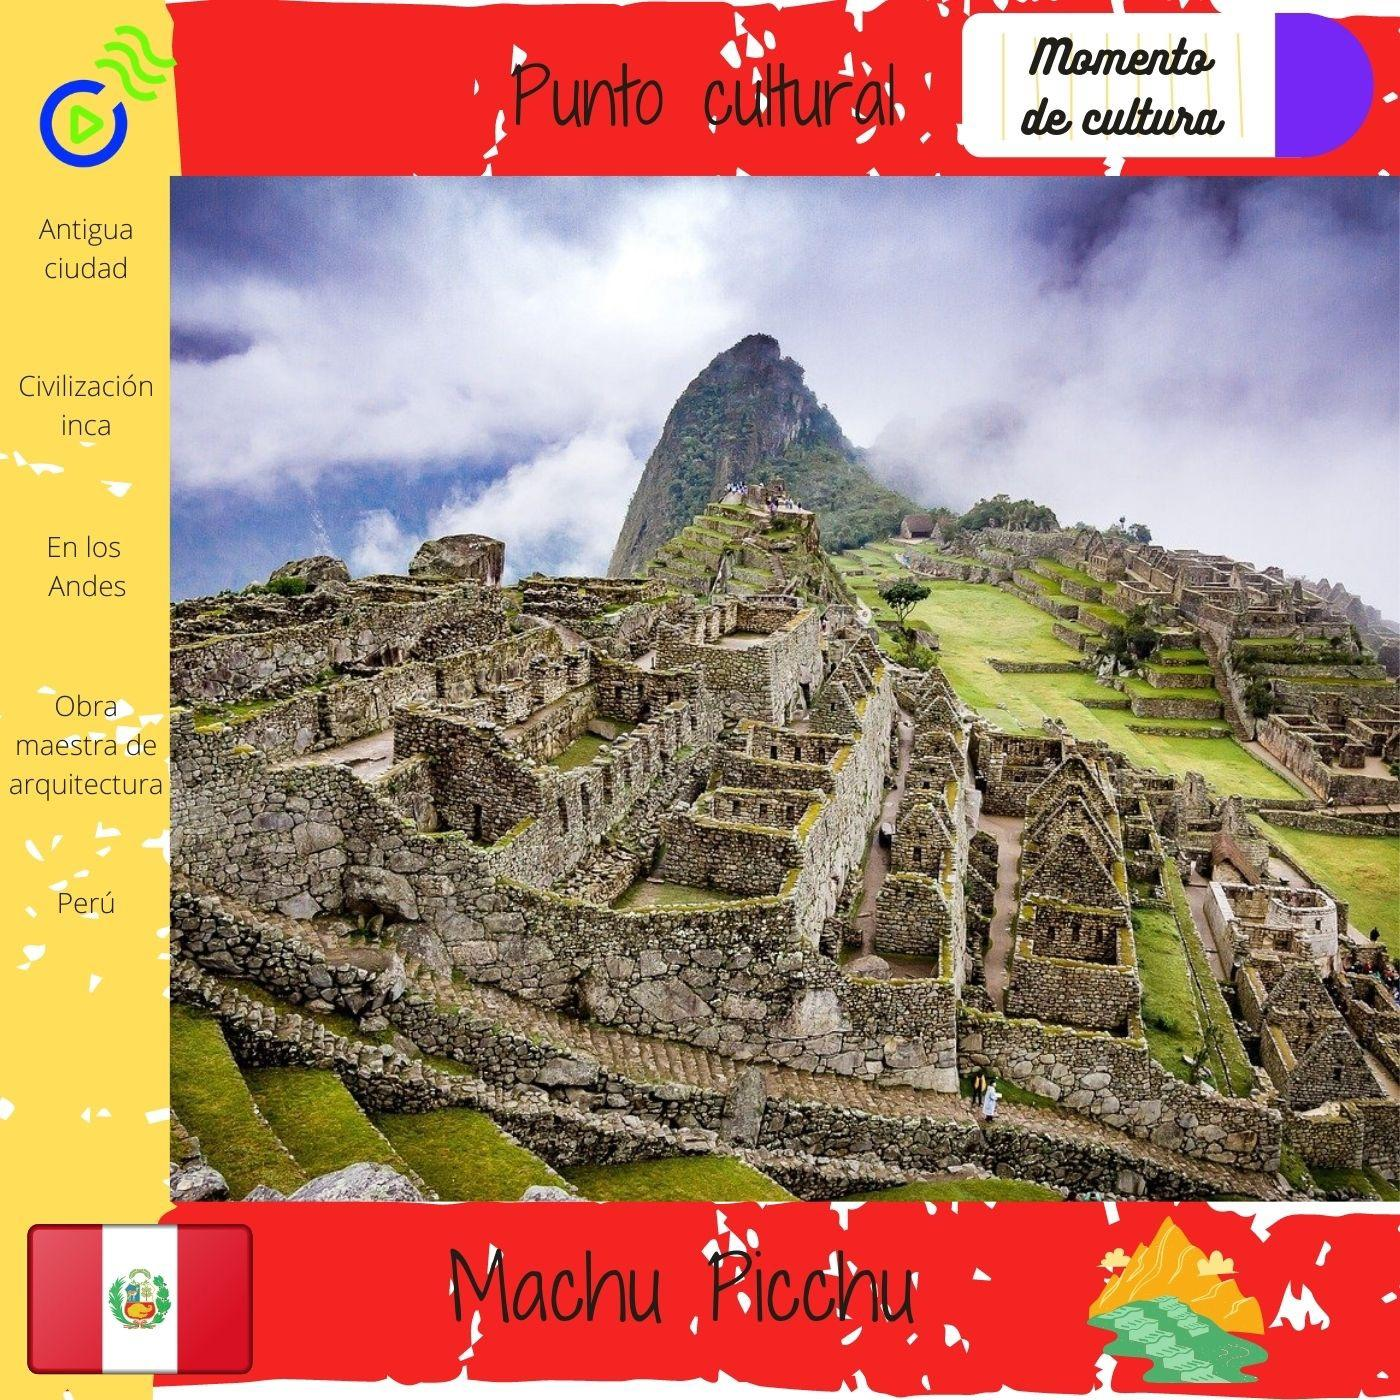 El Machu Picchu